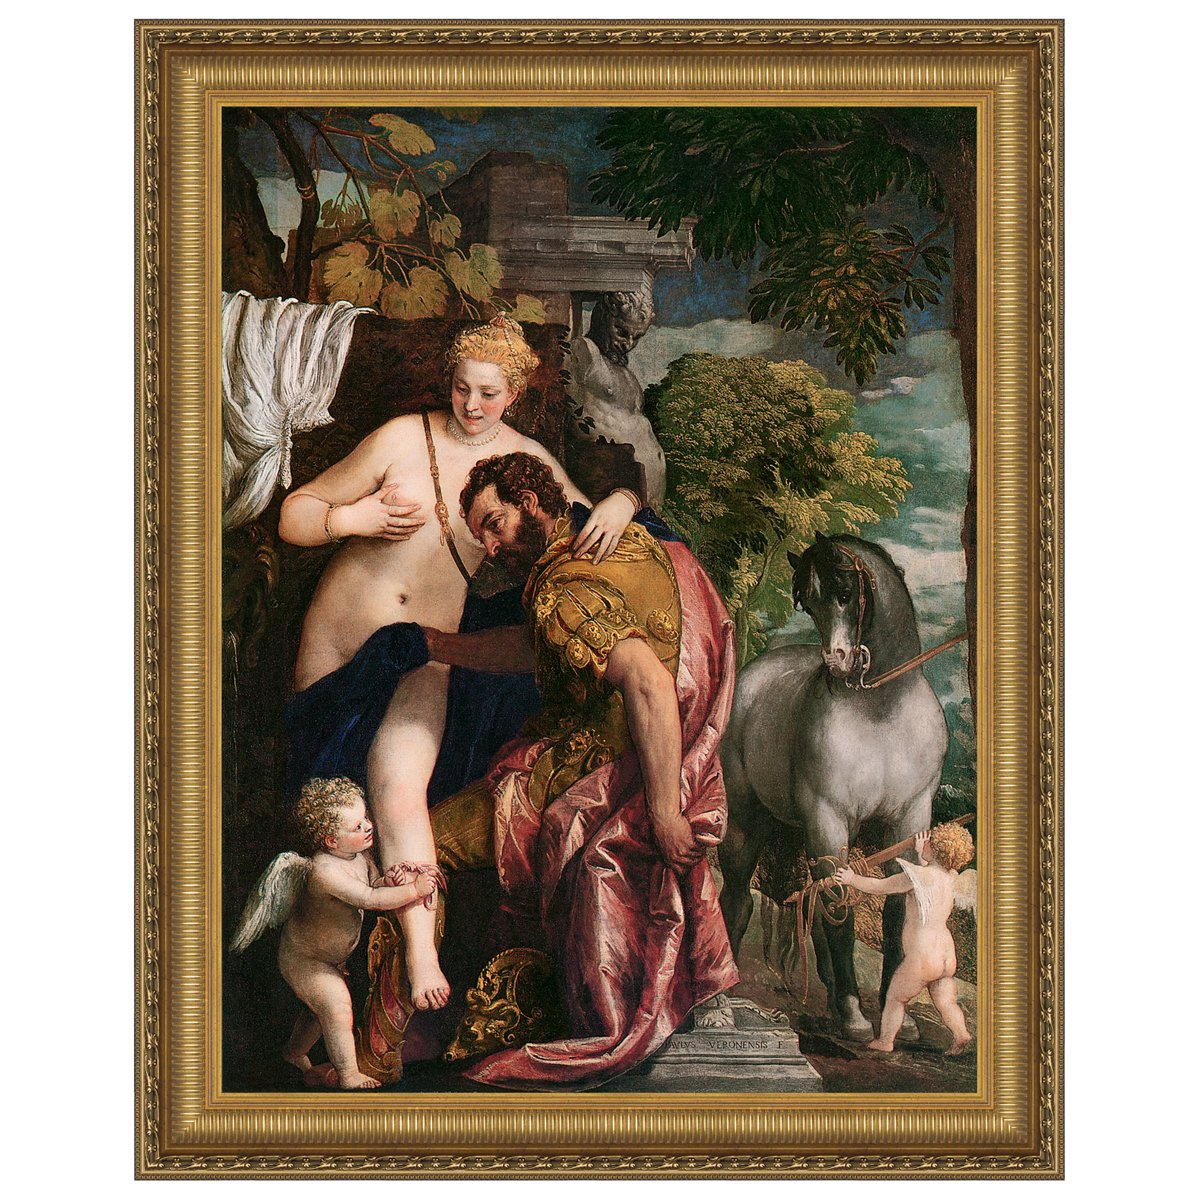 Design Toscano Venus and Mars United by Love, 1570: Canvas Replica Painting: Medium